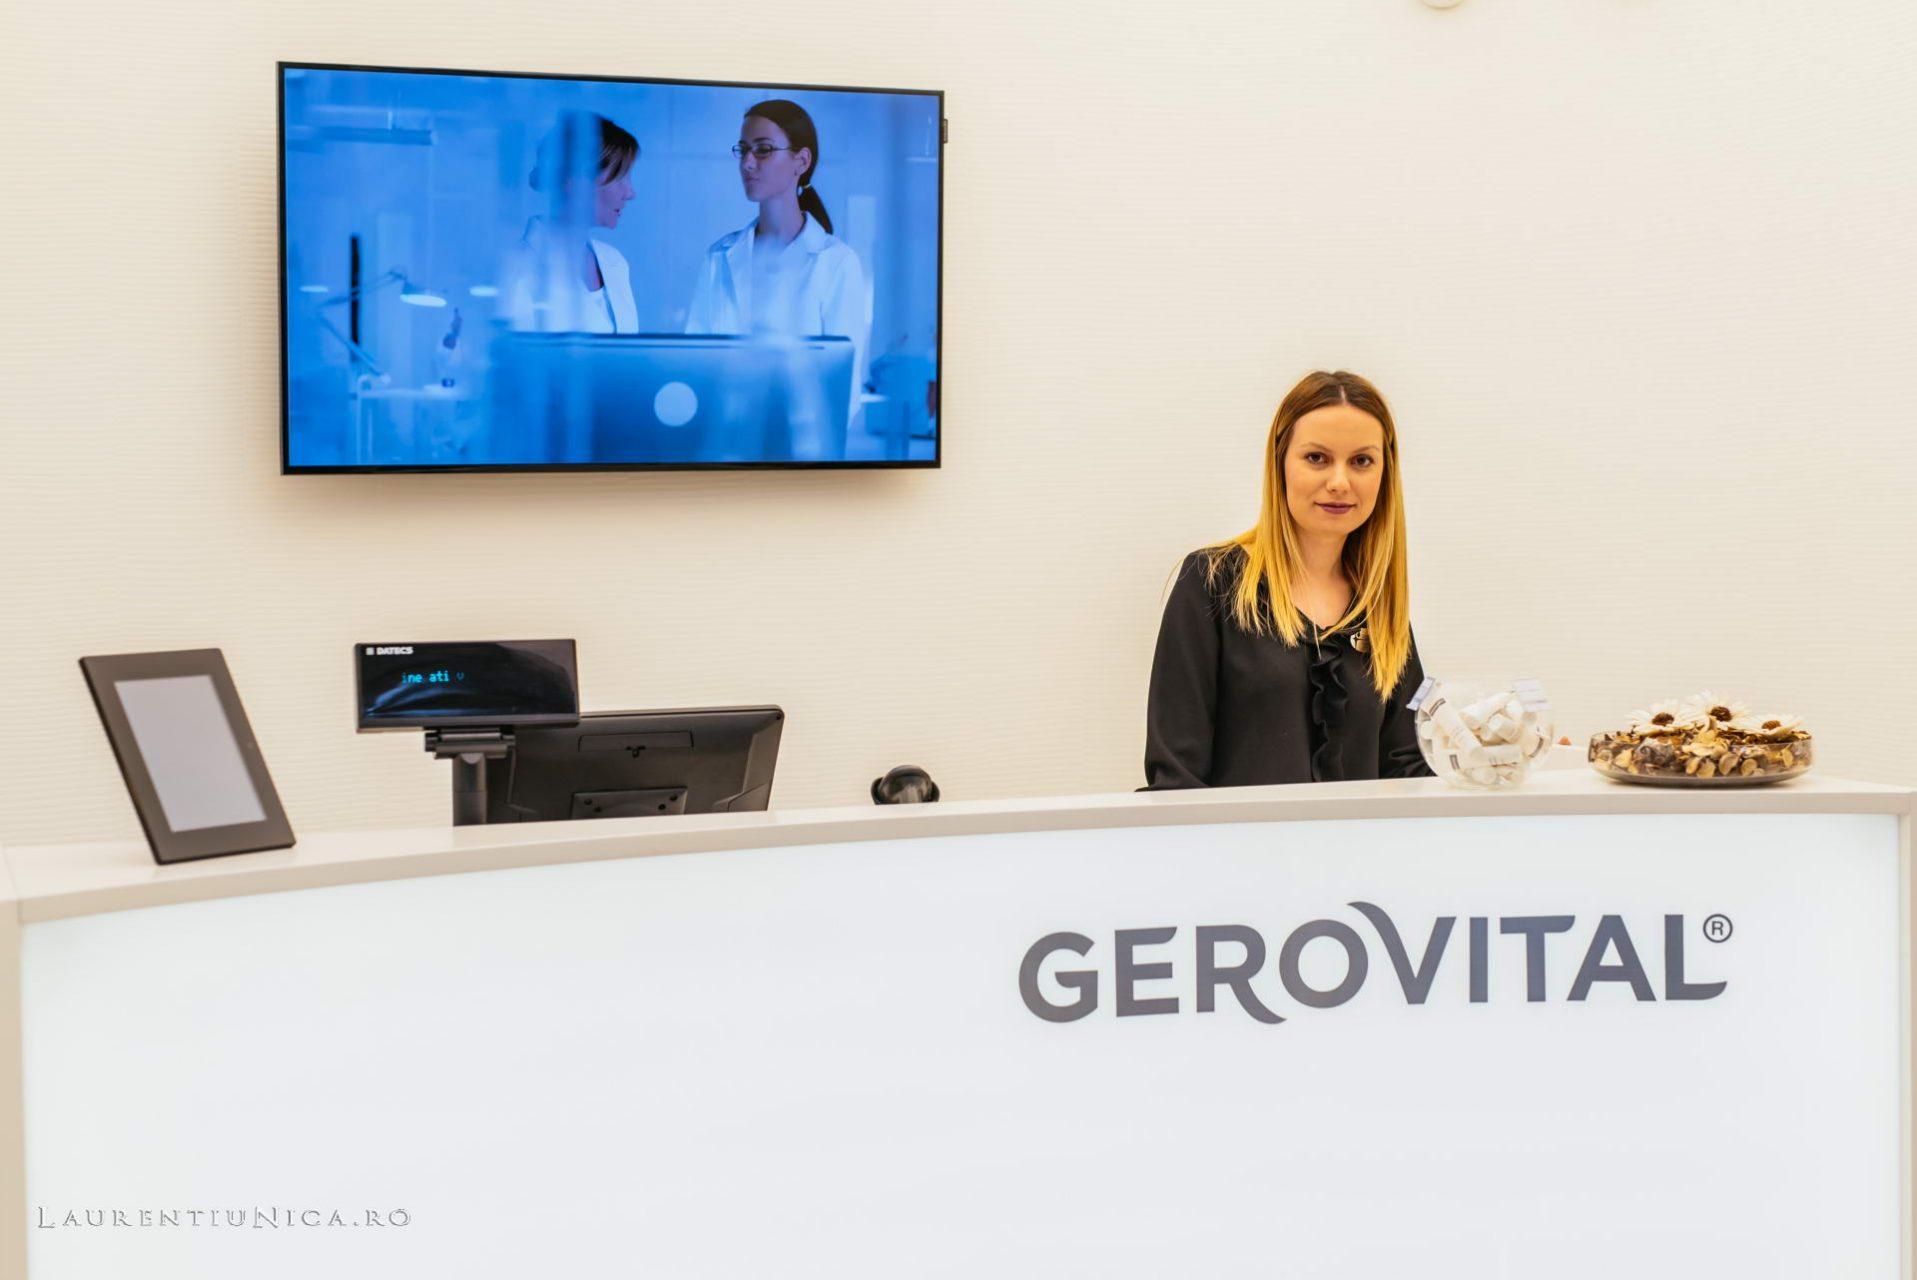 fotografii_corporate_comerciale_laurentiu_nica_craiova-15